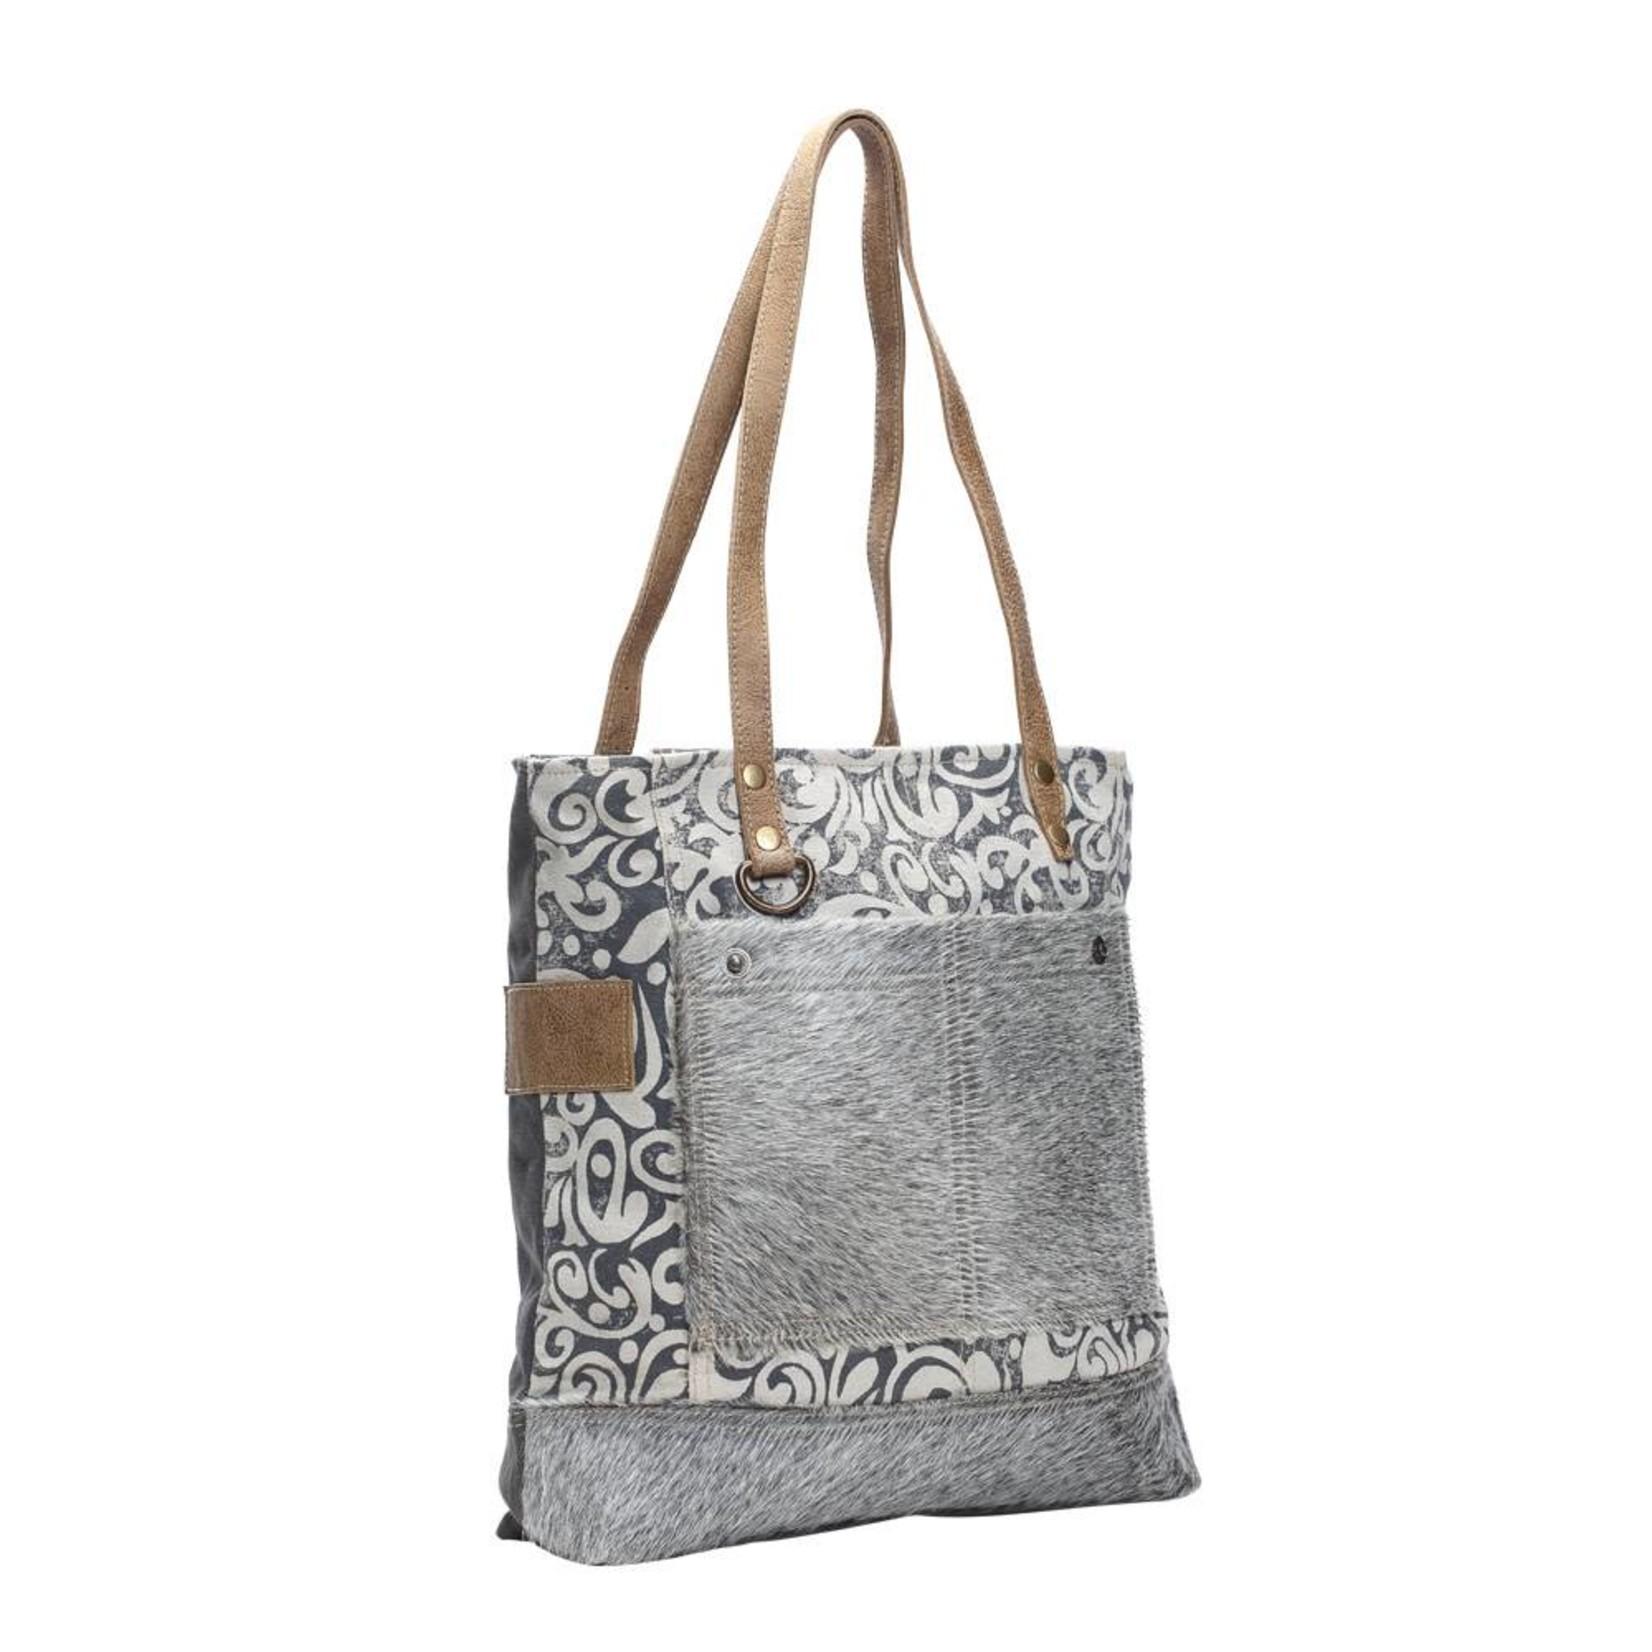 Myra Bags S-1139 Hairon Pockets Tote